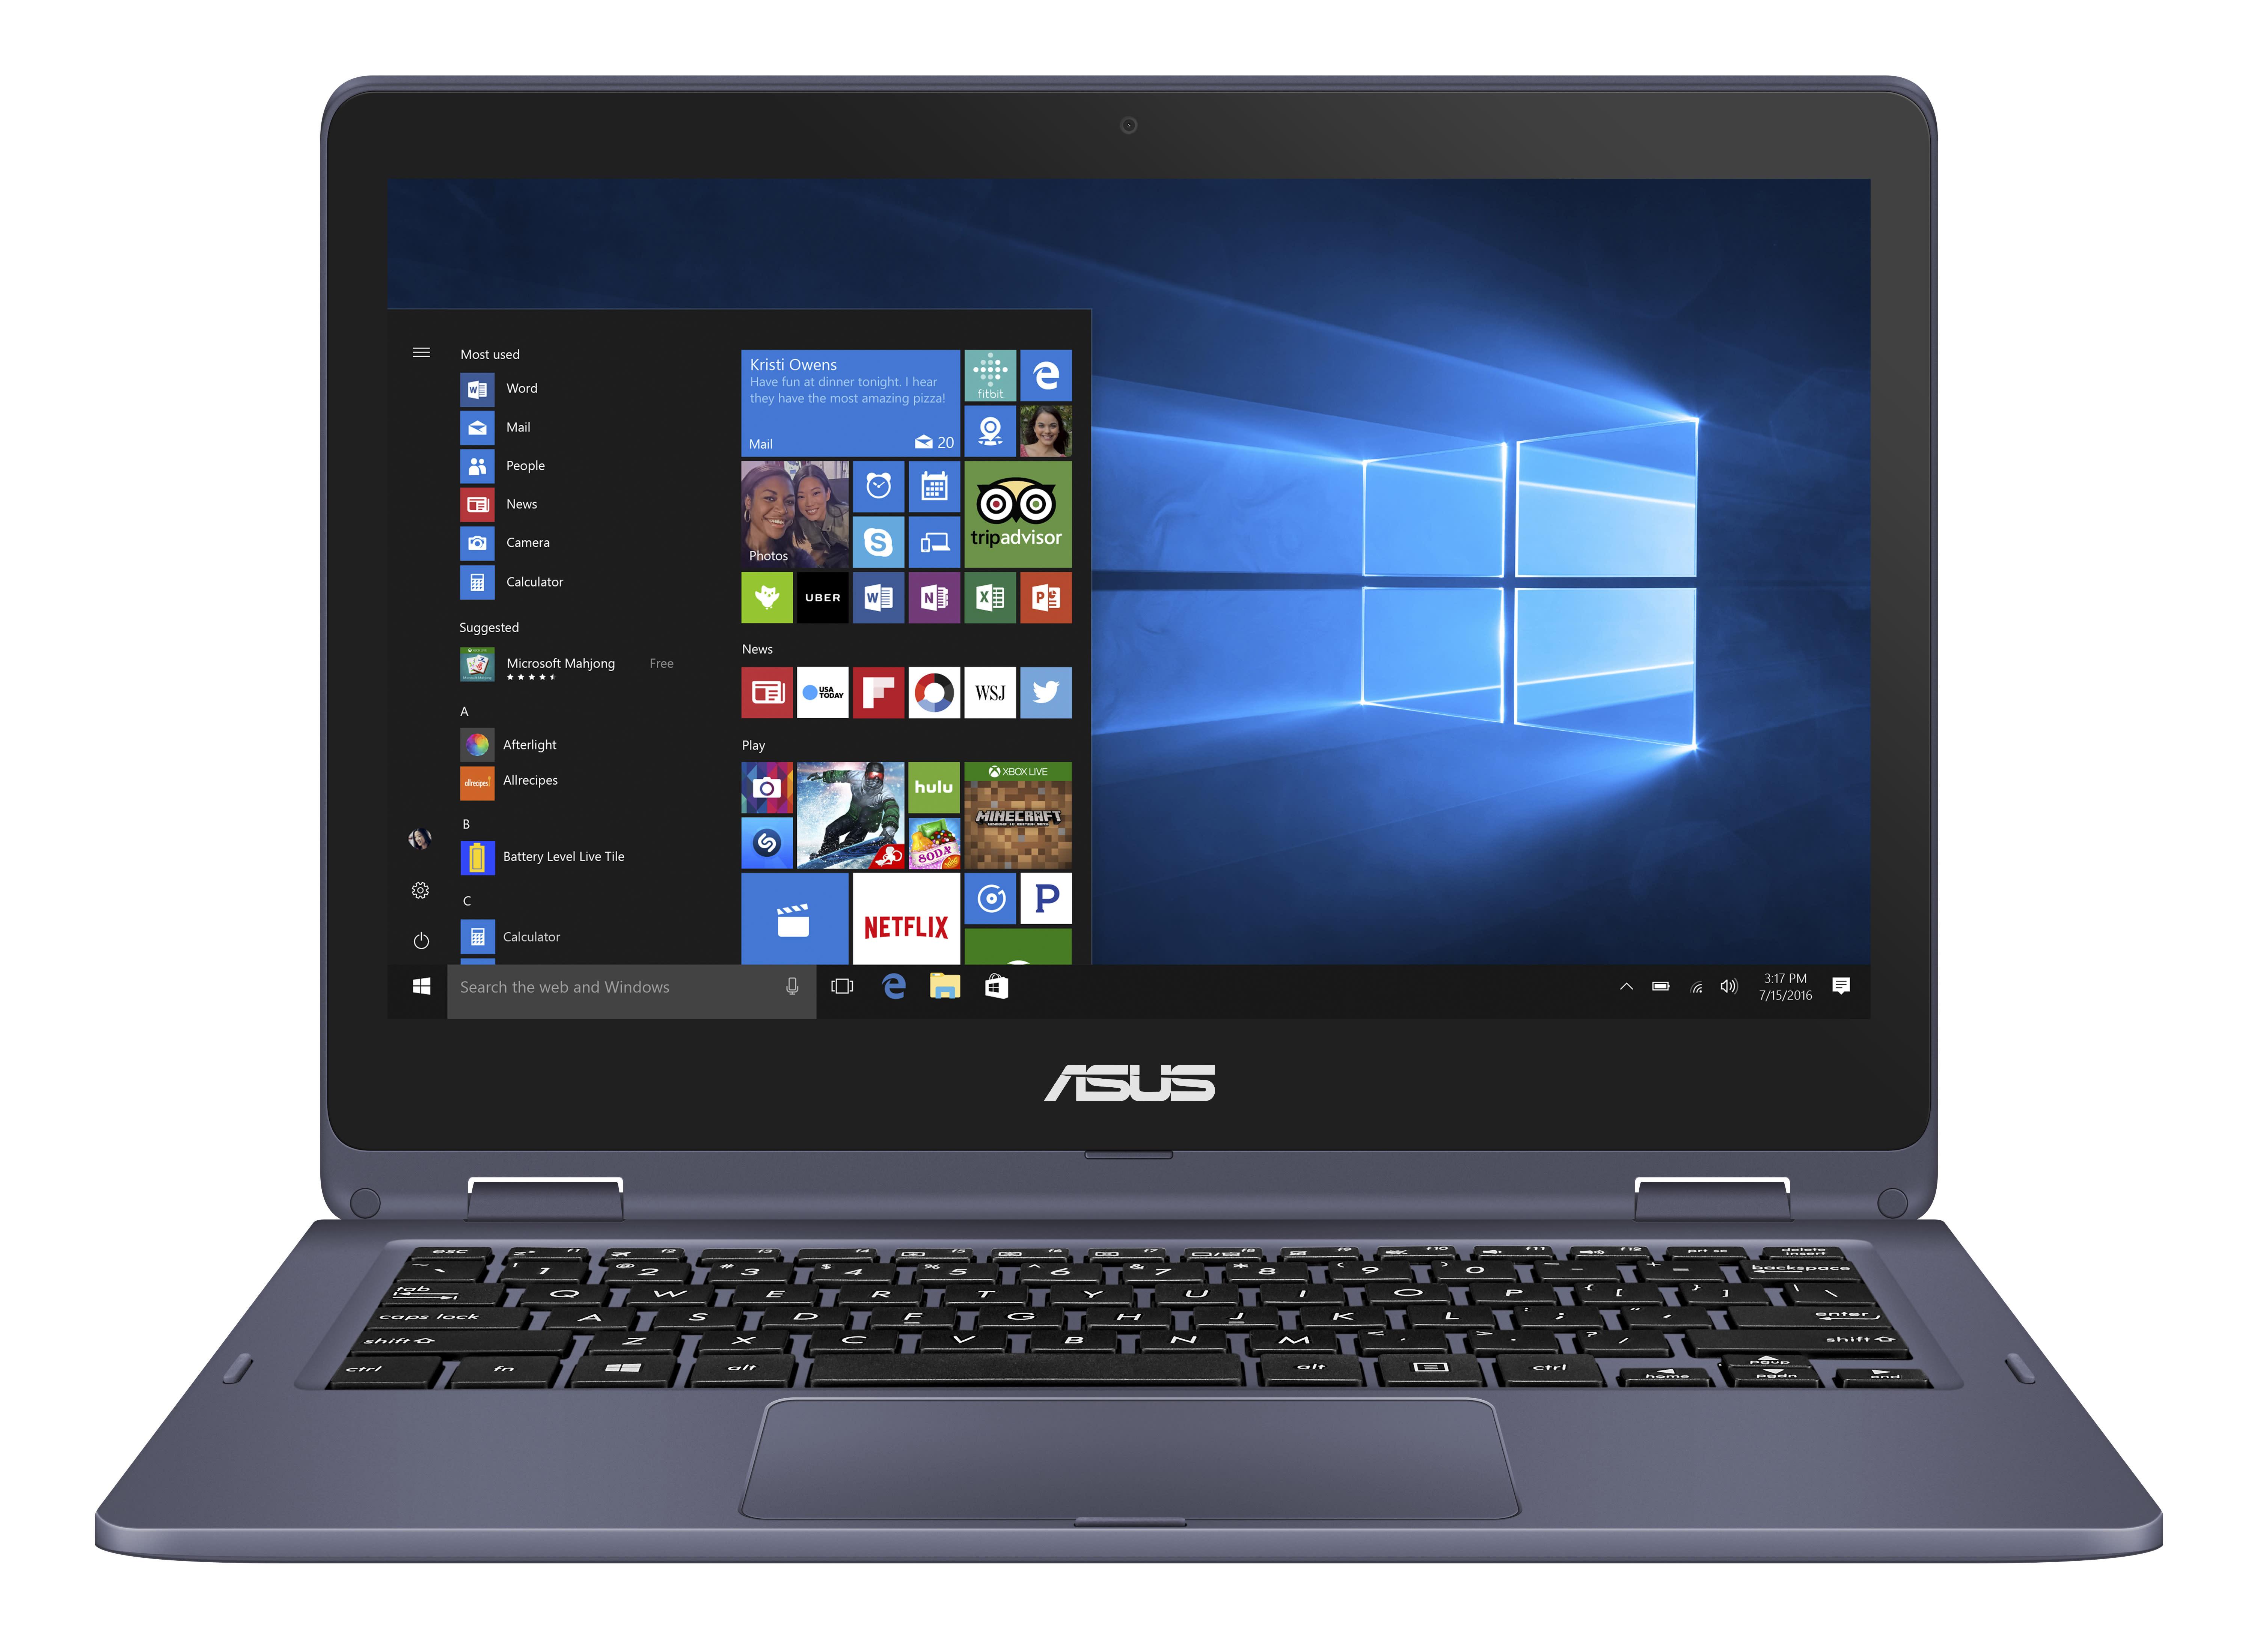 "ASUS VivoBook Flip Convertible Laptop, 11.6"" Touch Screen, 4GB Memory, 64GB eMMC Drive, Windows® 10 in S Mode, Demo"